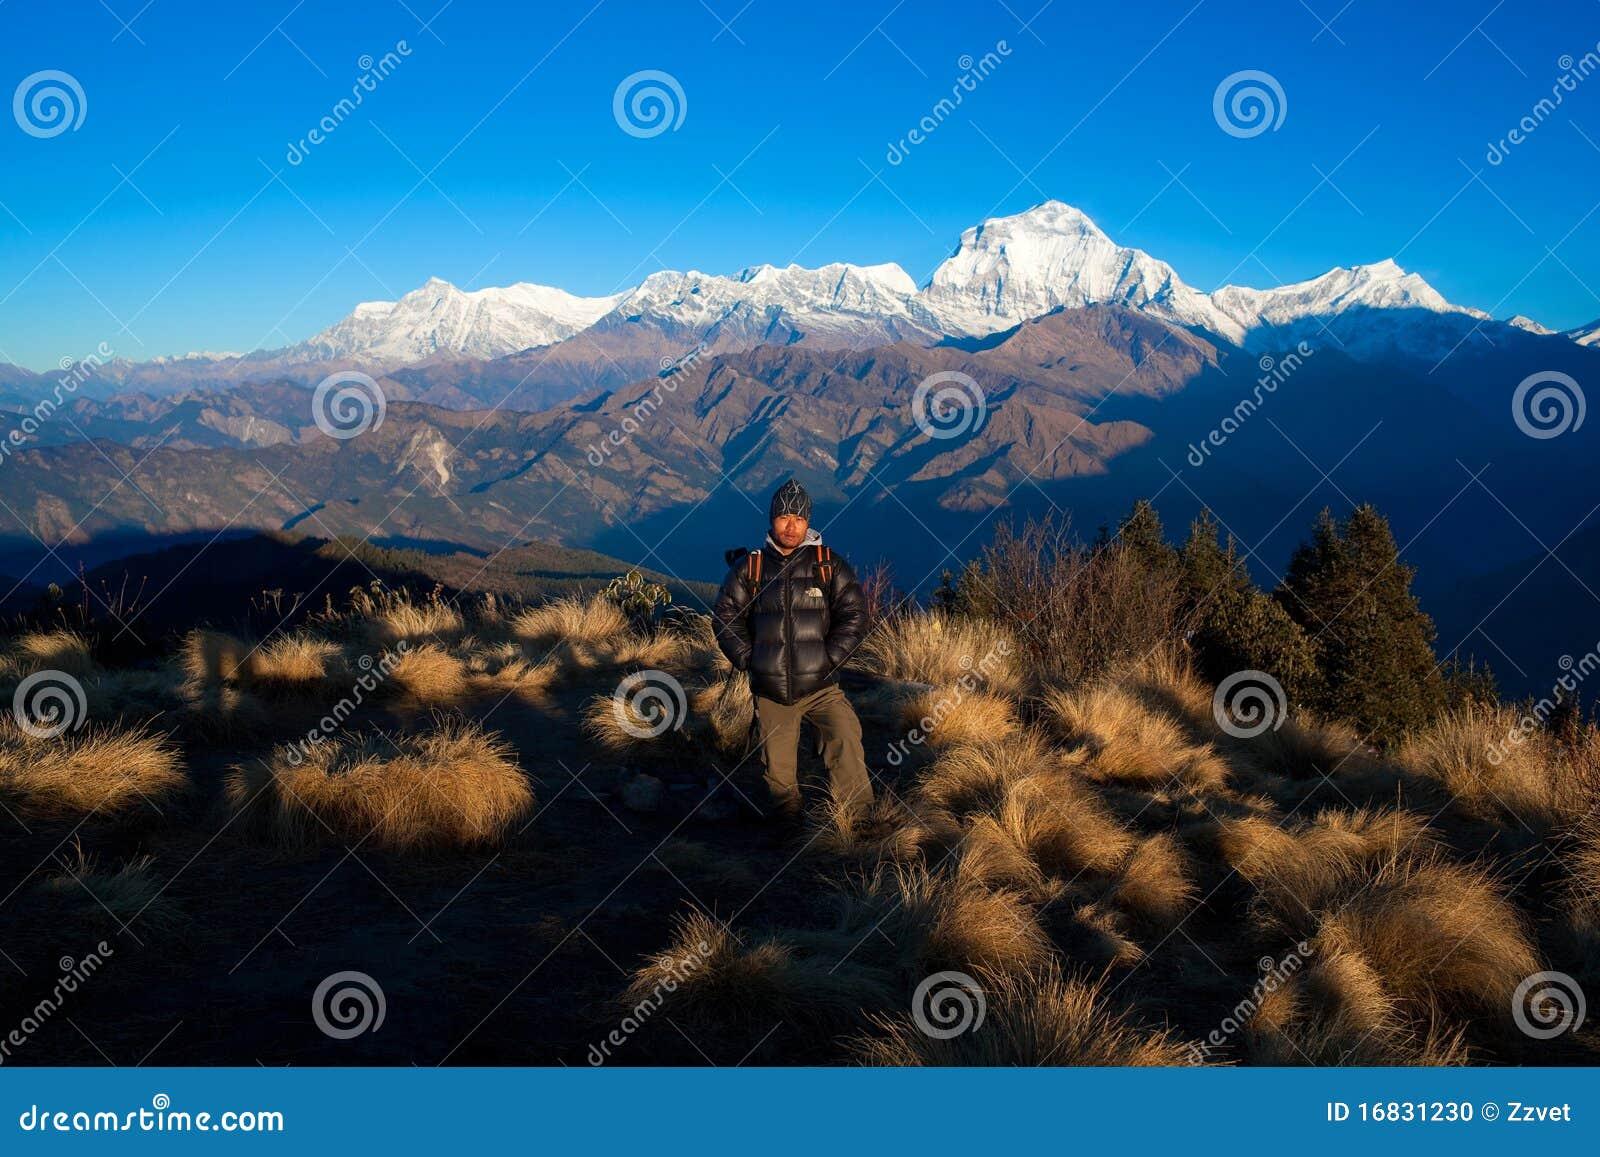 Poon Hill and Dhaulagiri